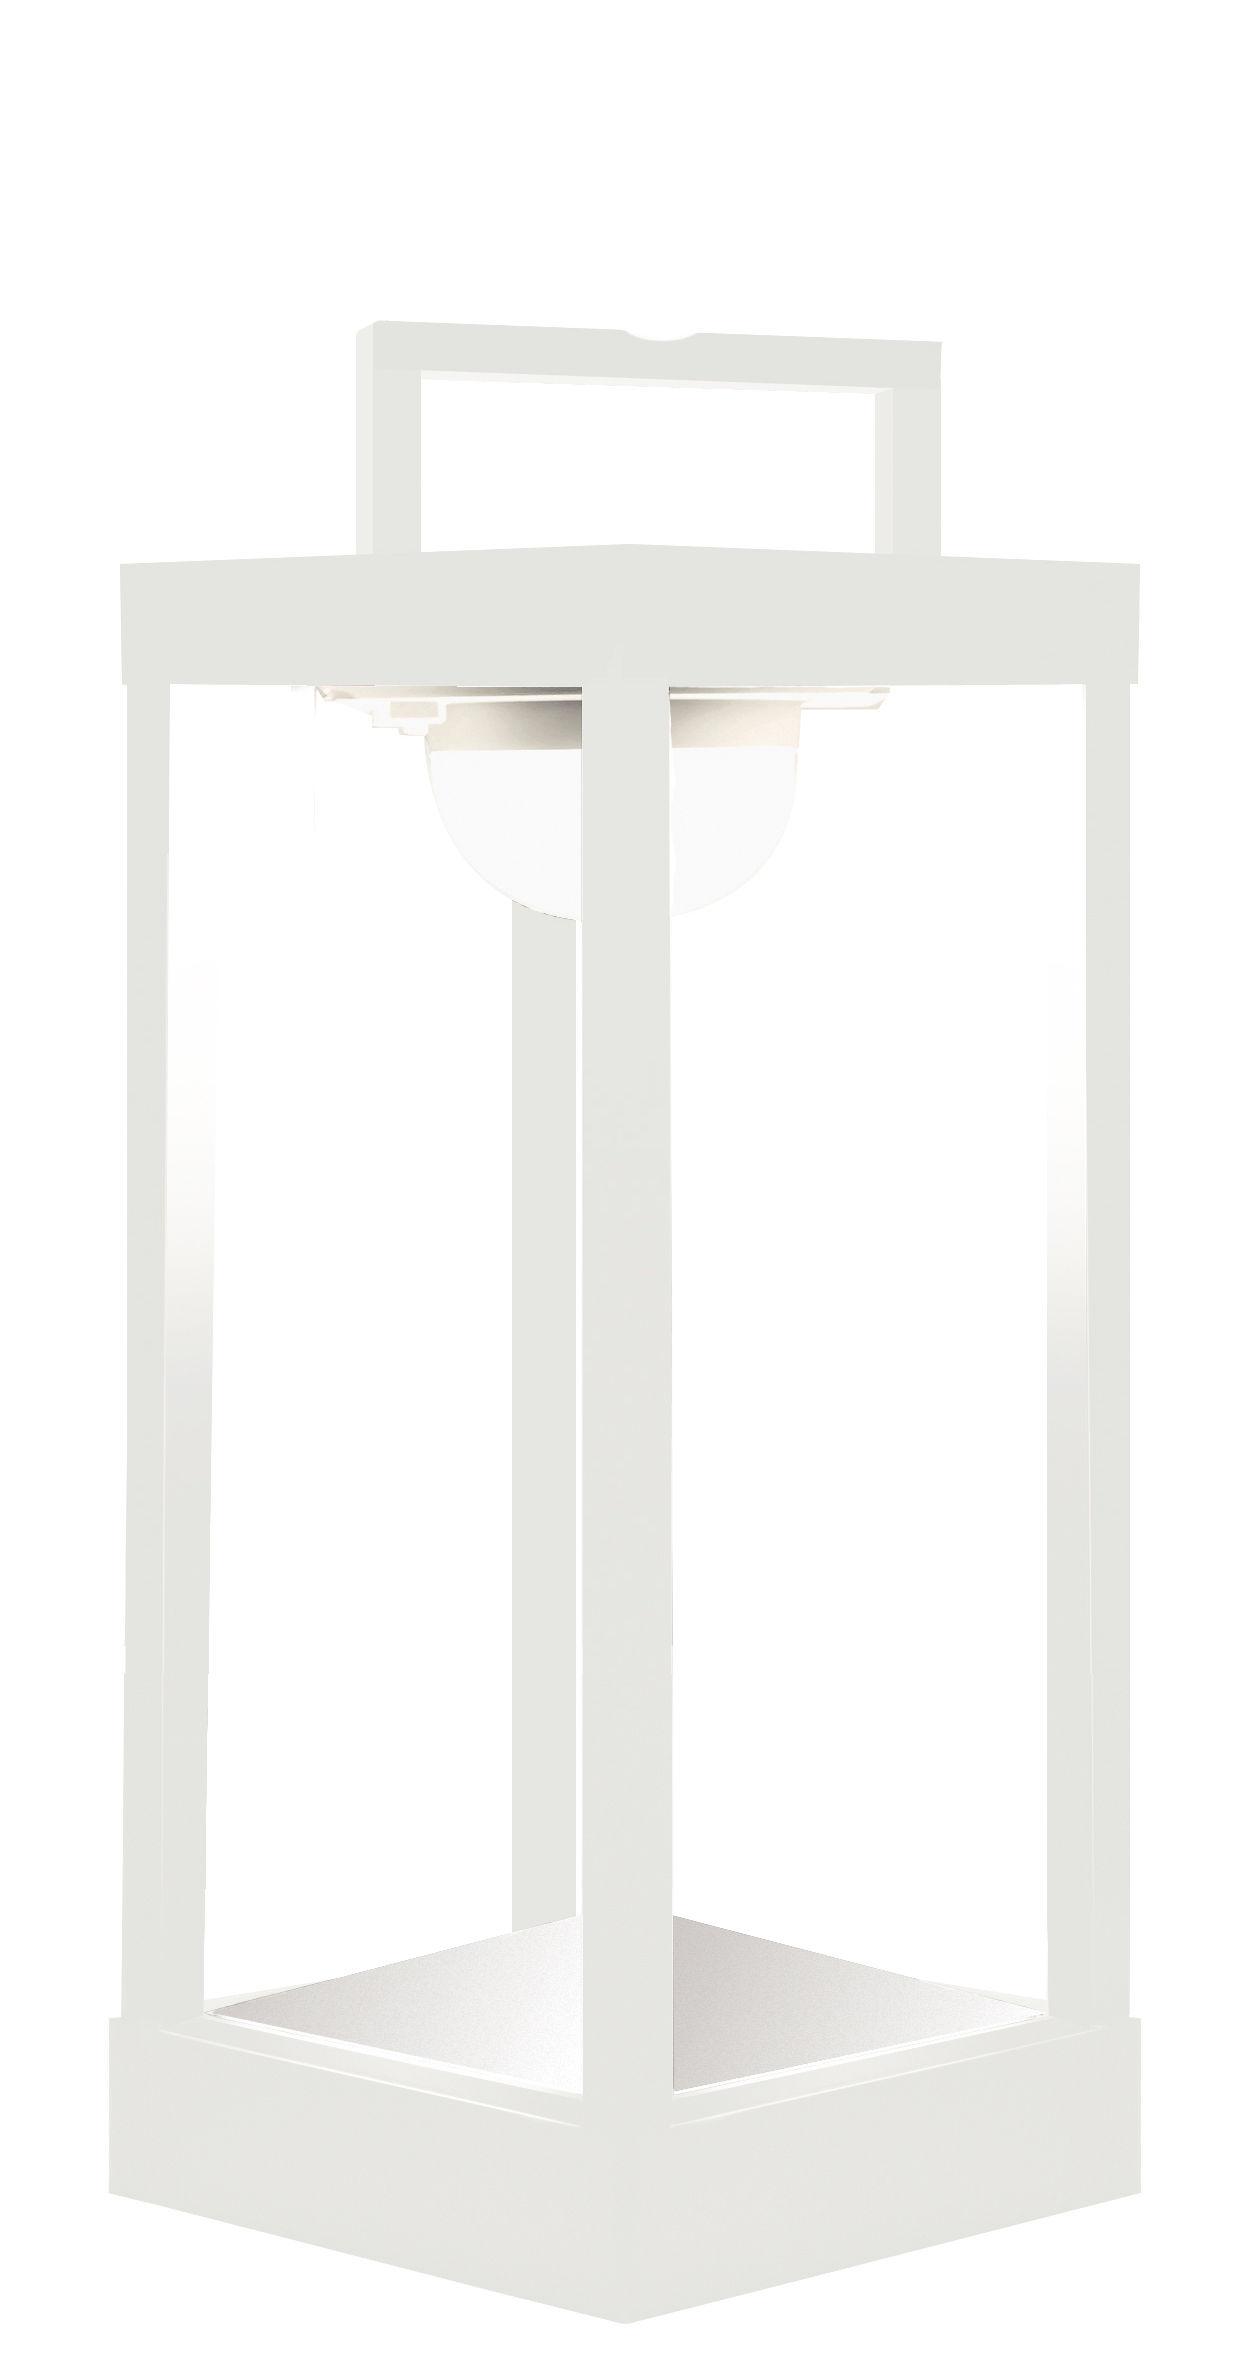 Leuchten - Tischleuchten - La Lampe Parc M Solarlampe LED / kabellos - H 40 cm - Maiori - Weiß - Aluminium, Glas